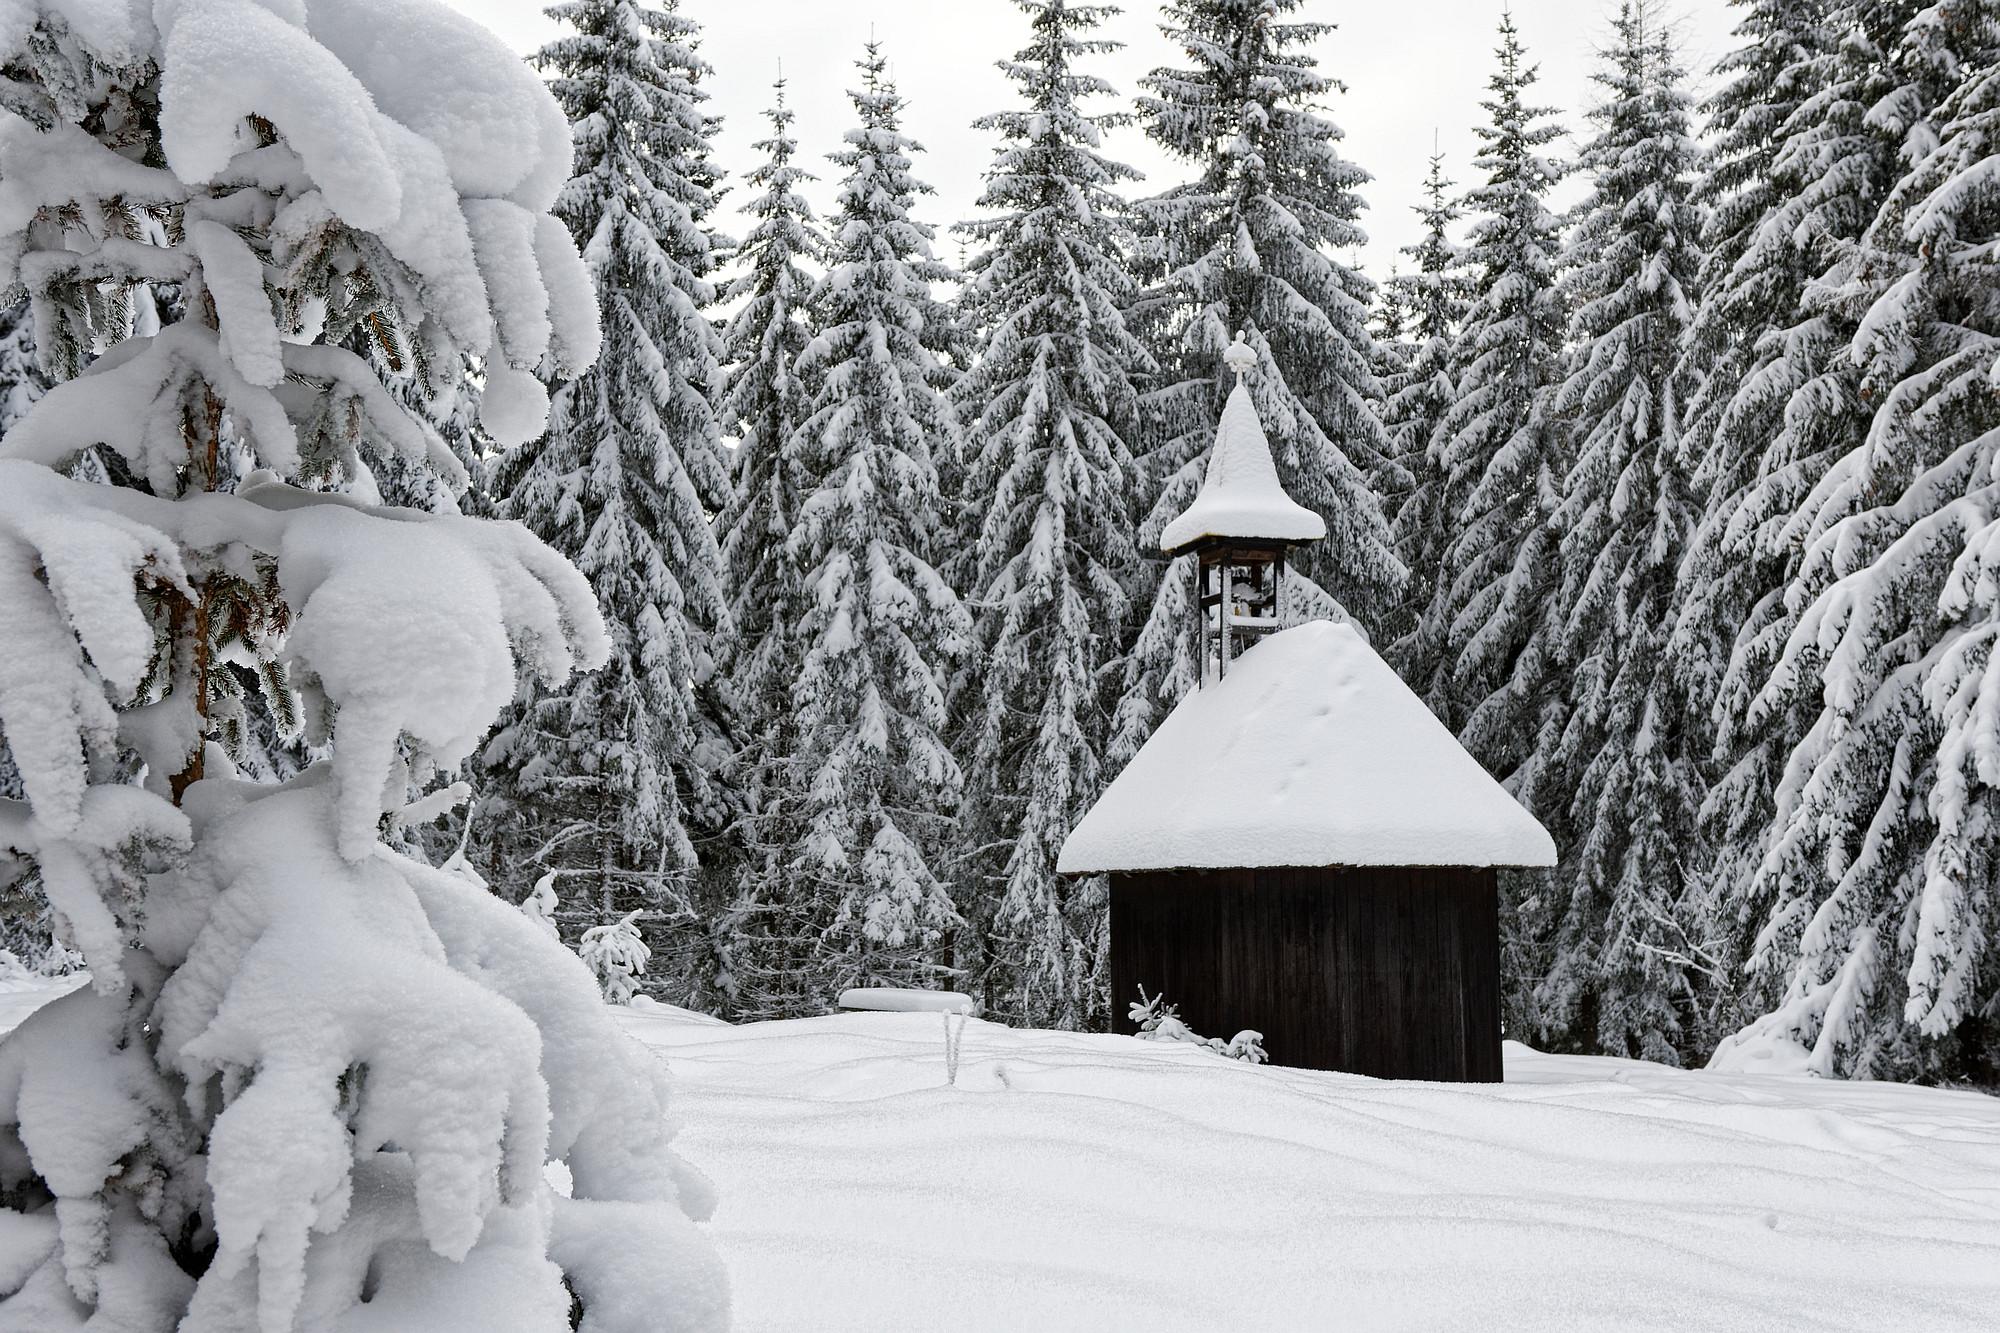 kapelle im schnee 2021-01-11